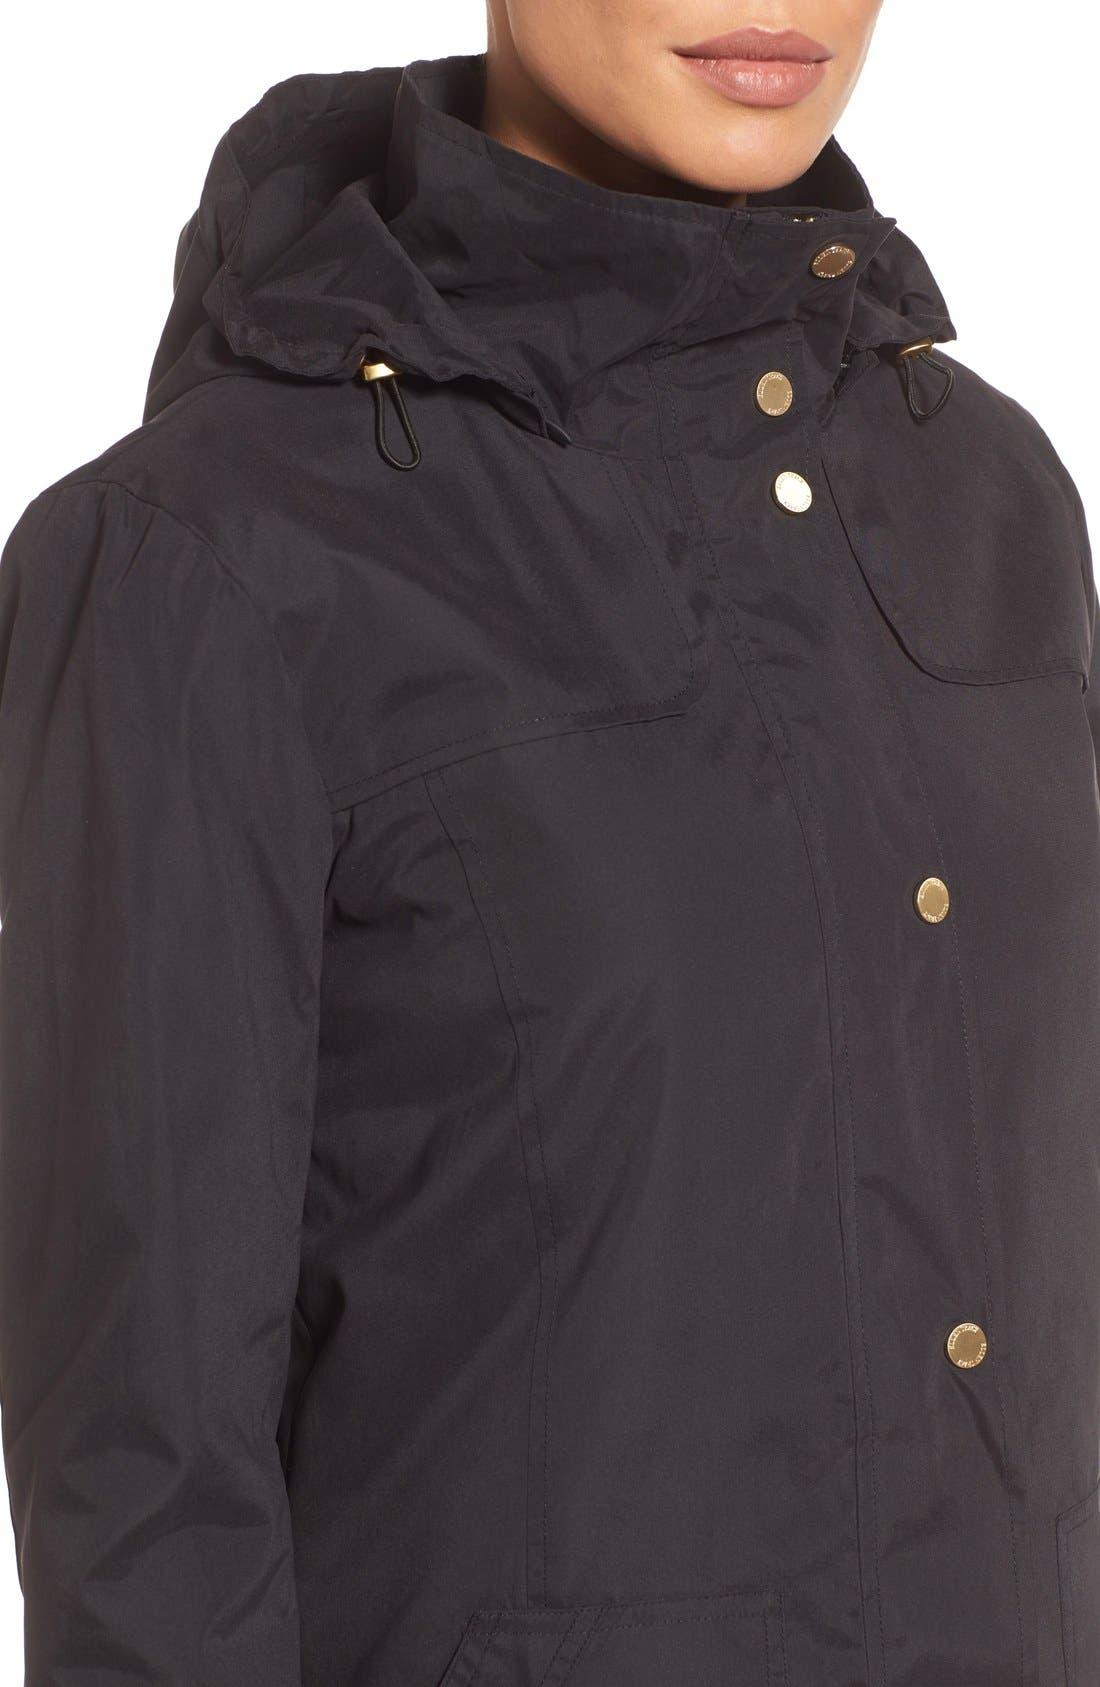 A-Line Raincoat with Detachable Hood,                             Alternate thumbnail 5, color,                             001